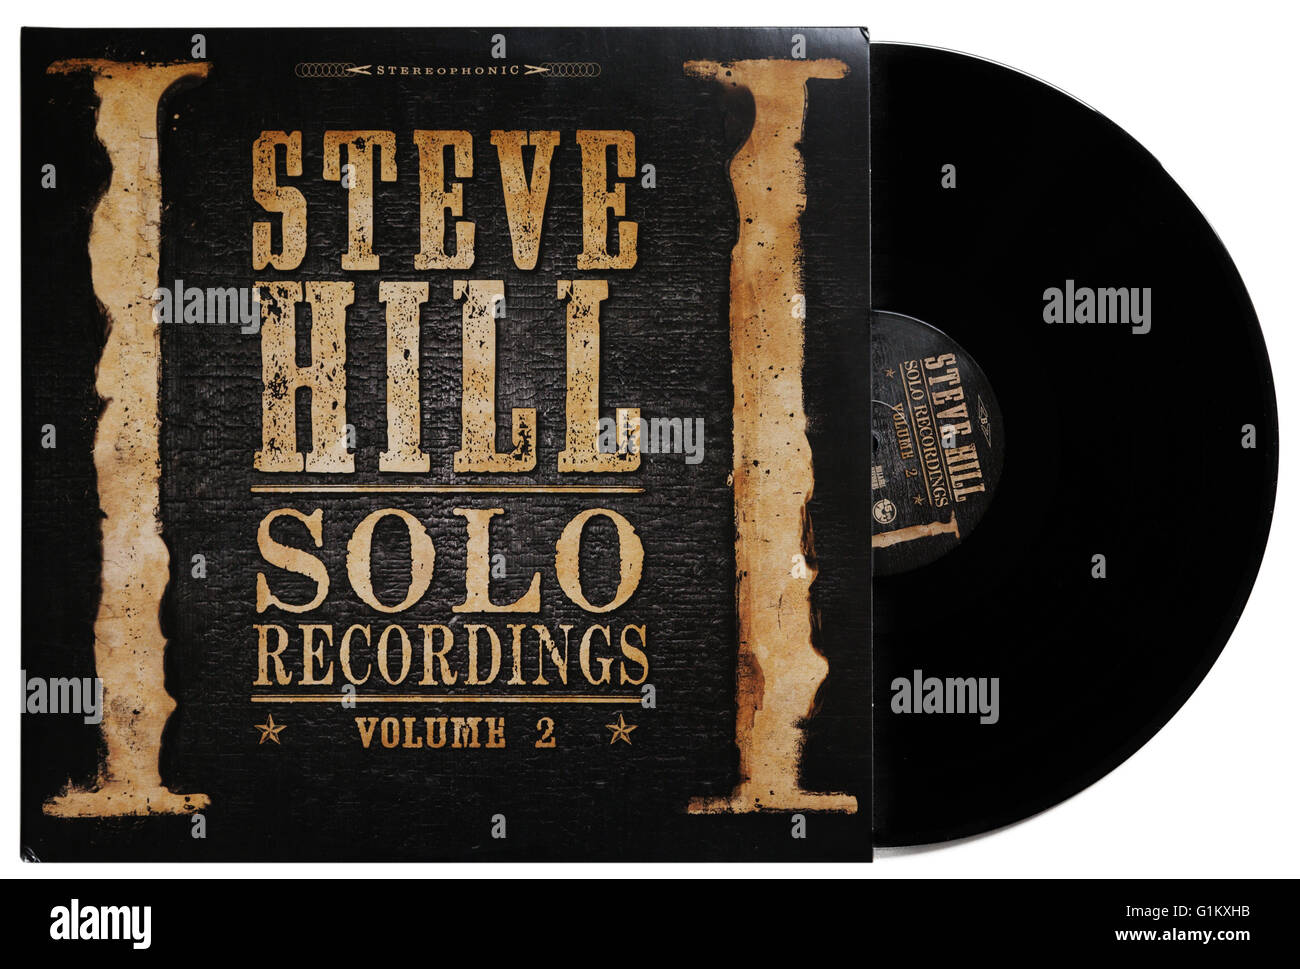 Steve Hill Solo Recordings Volume 2 album Stock Photo: 104314823 - Alamy